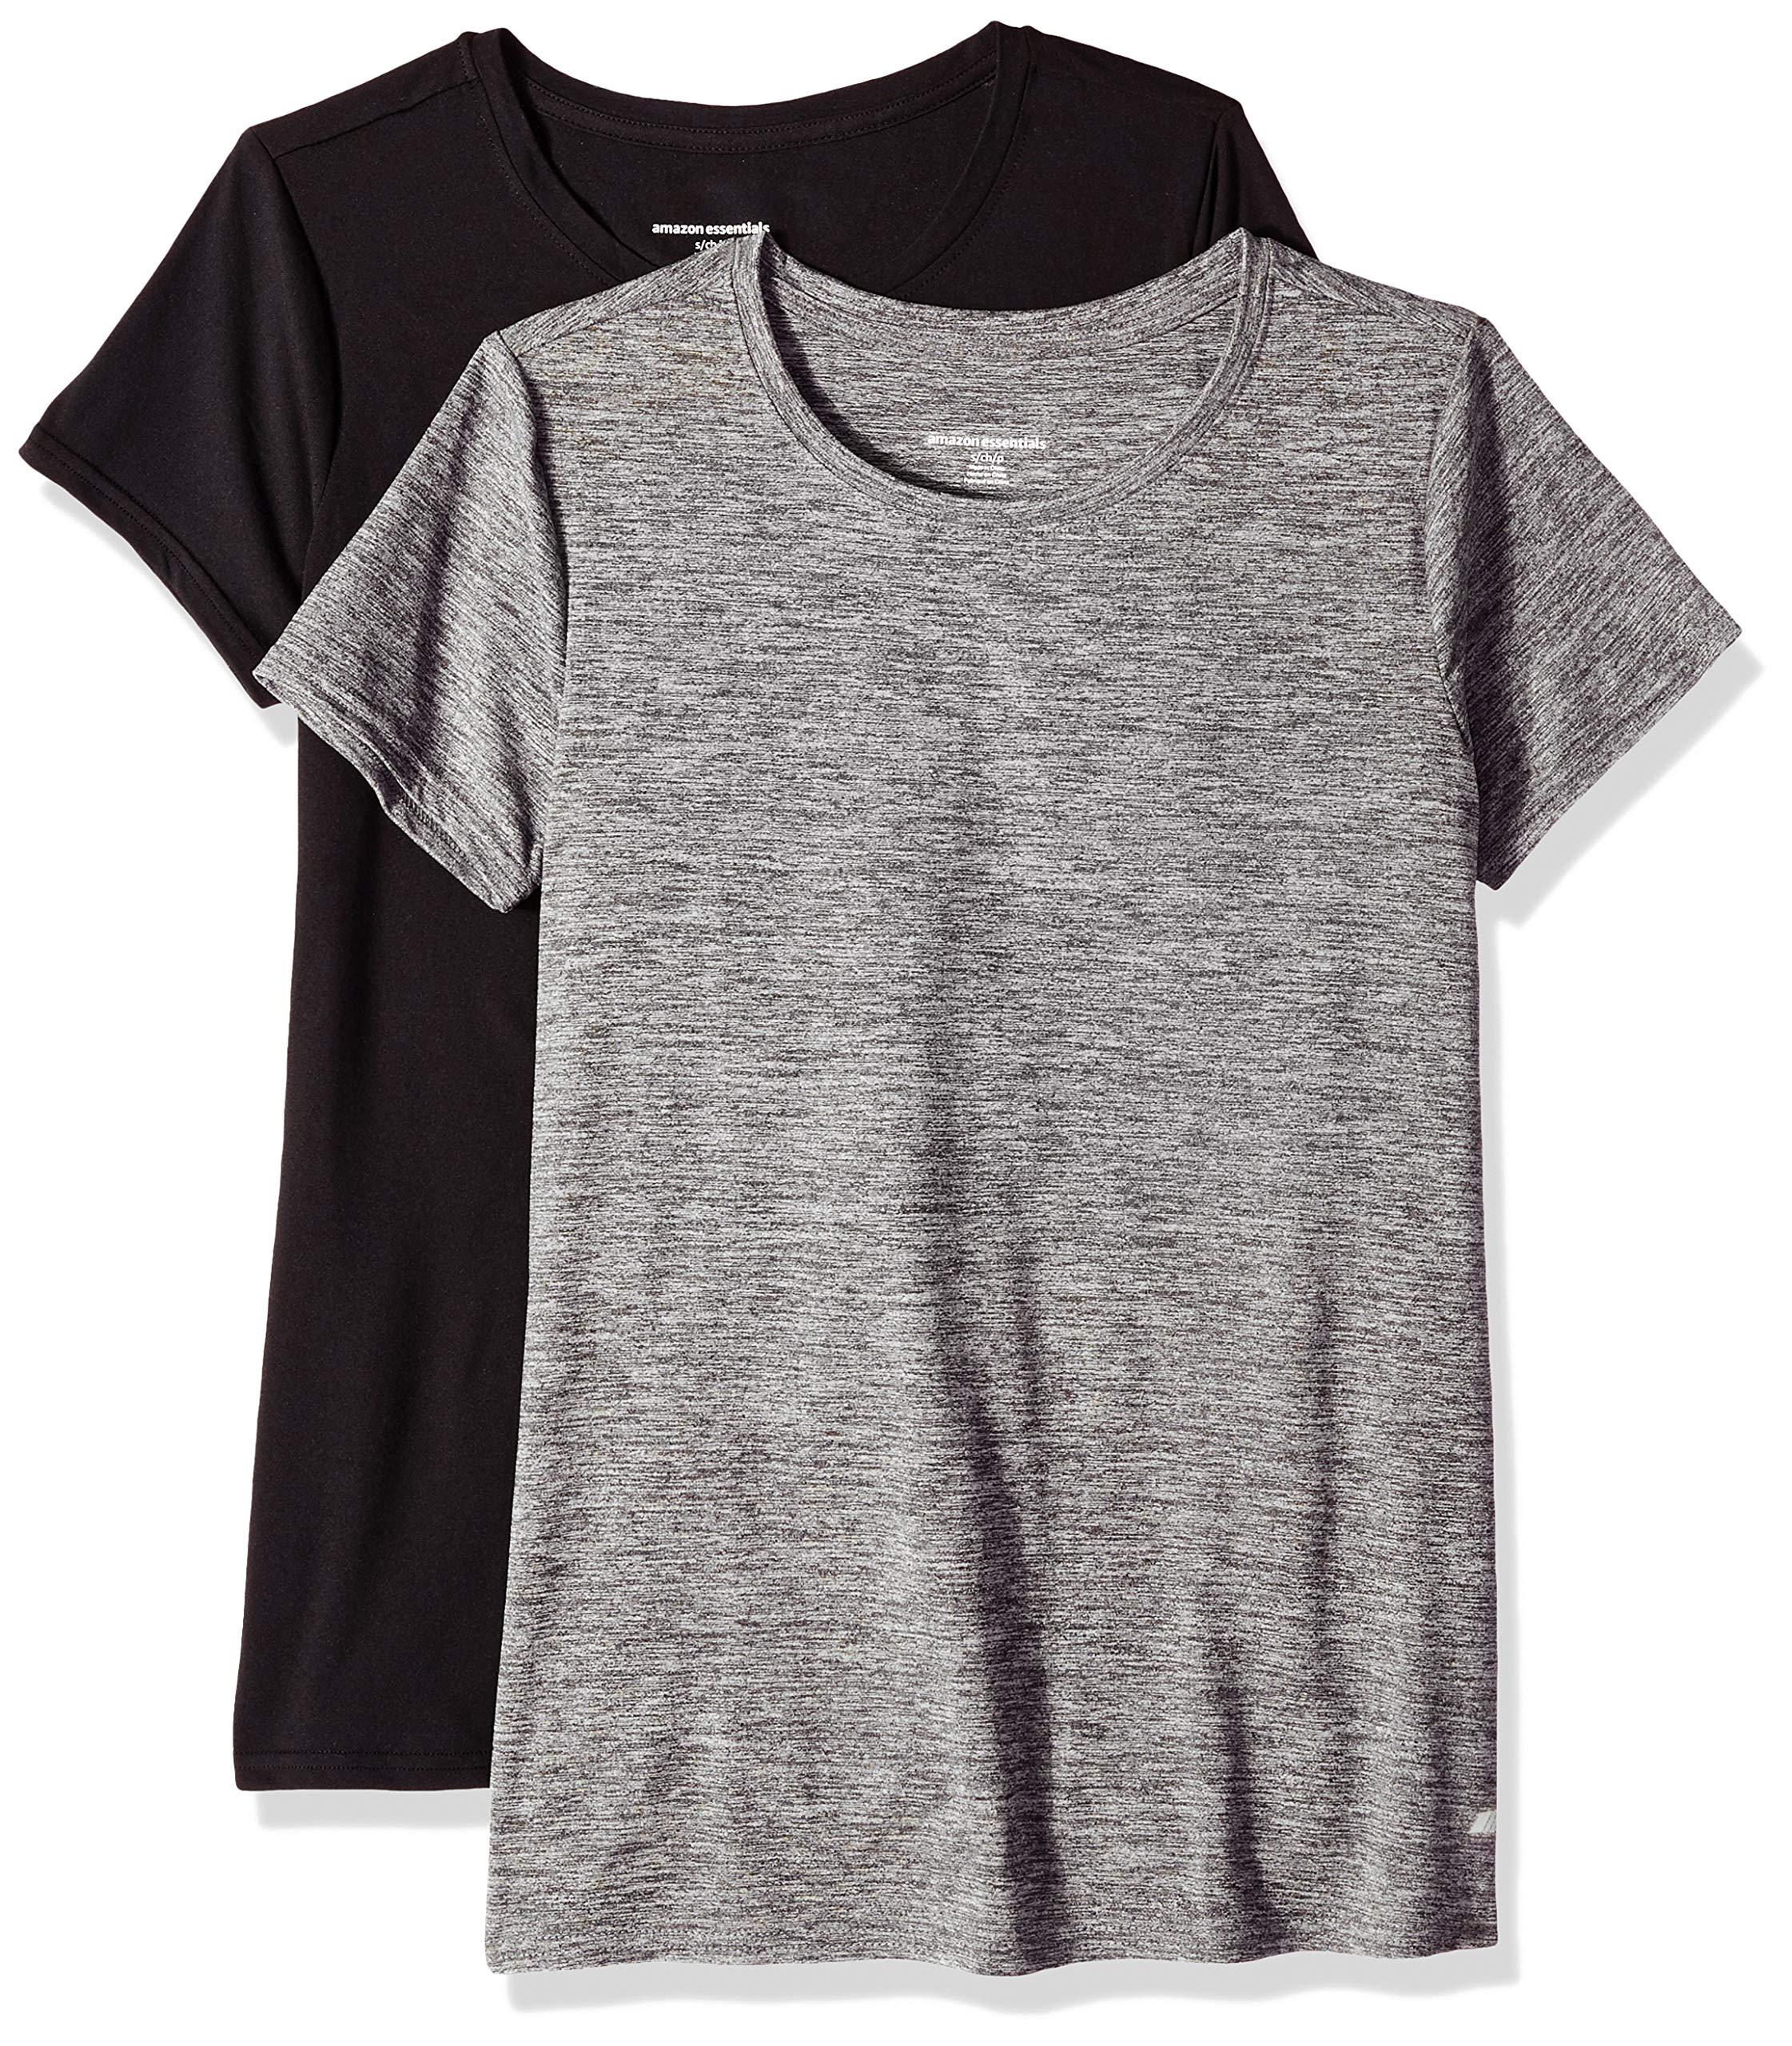 Amazon Essentials Women's 2-Pack Tech Stretch Short-Sleeve Crewneck T-Shirt, -black space dye/black, X-Large by Amazon Essentials